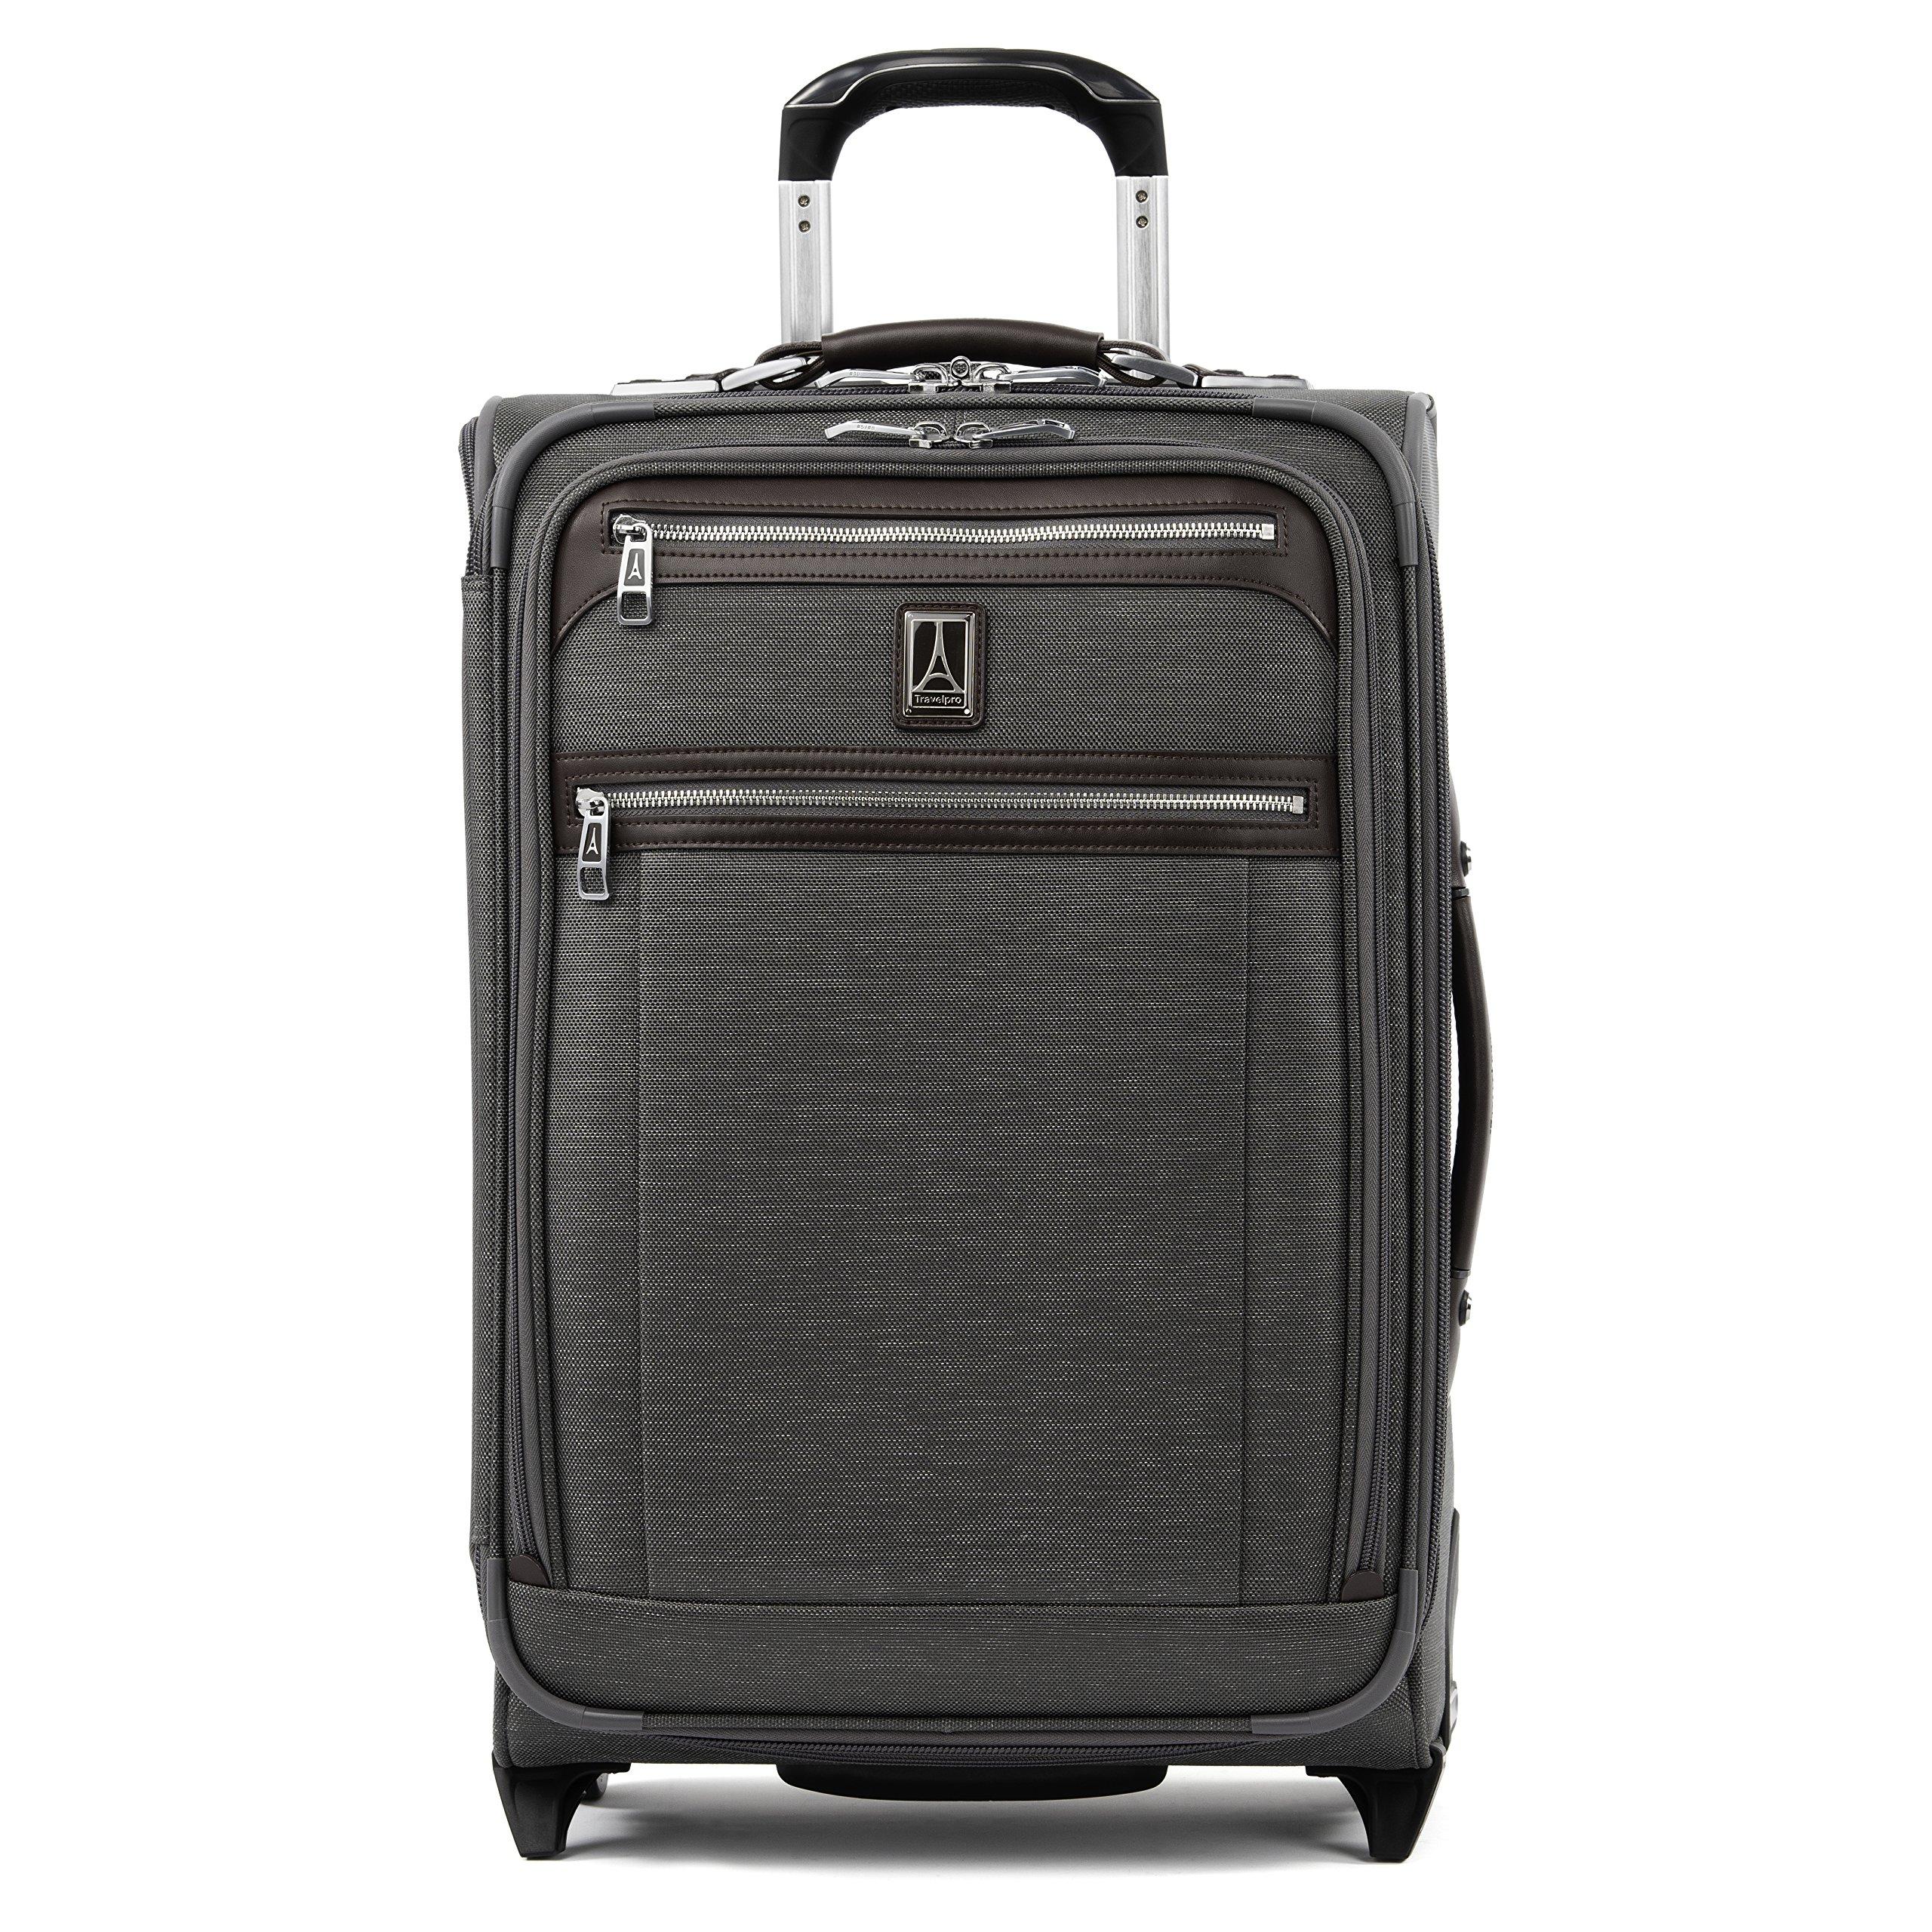 Travelpro Luggage Platinum Elite 22'' Carry-on Expandable Rollaboard w/USB Port, Vintage Grey